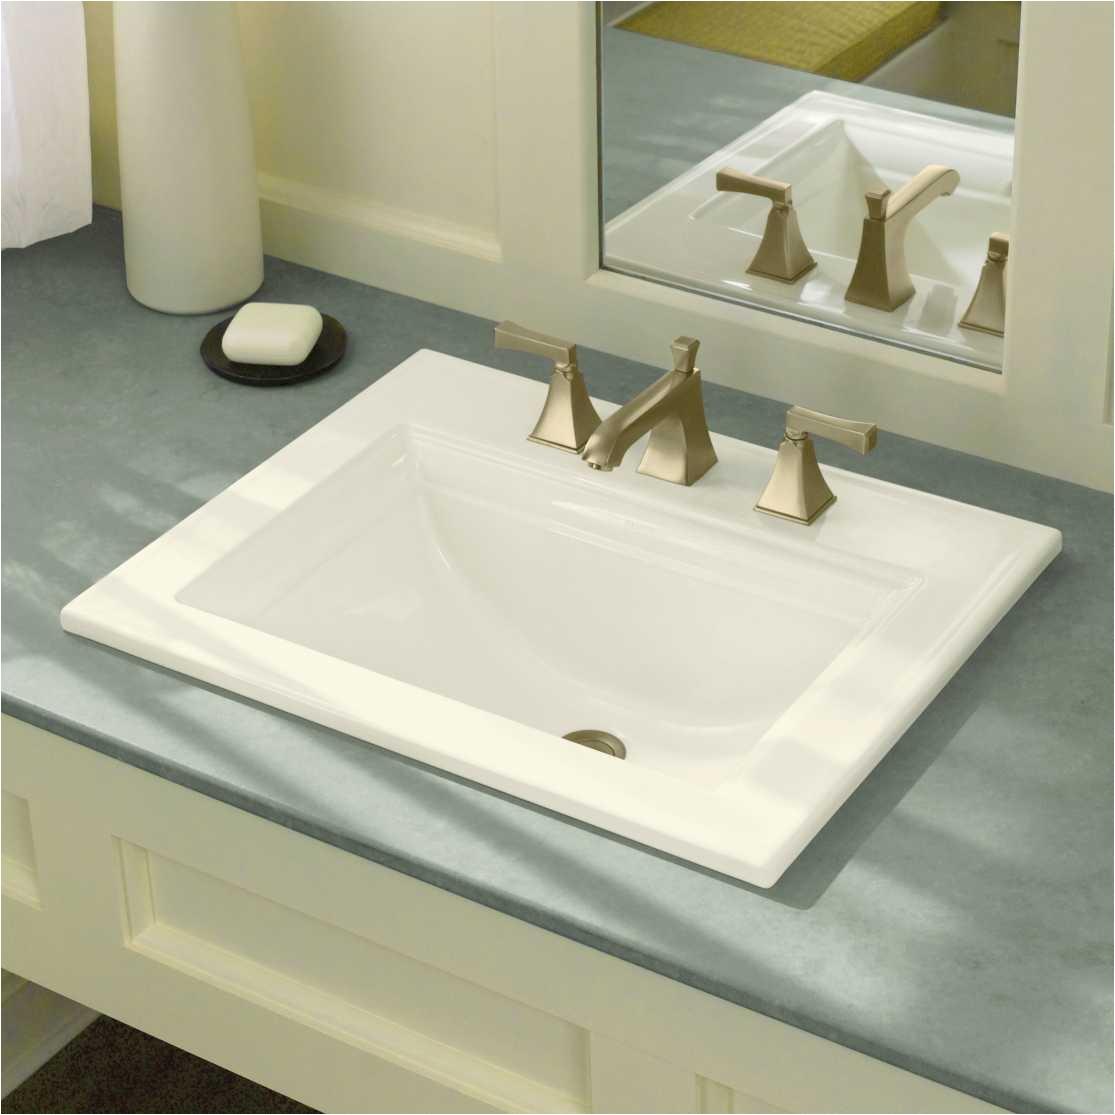 lowes bathroom sinks new aaa 1800x800h sink kohler bathroom toilets lowes 0d 2323